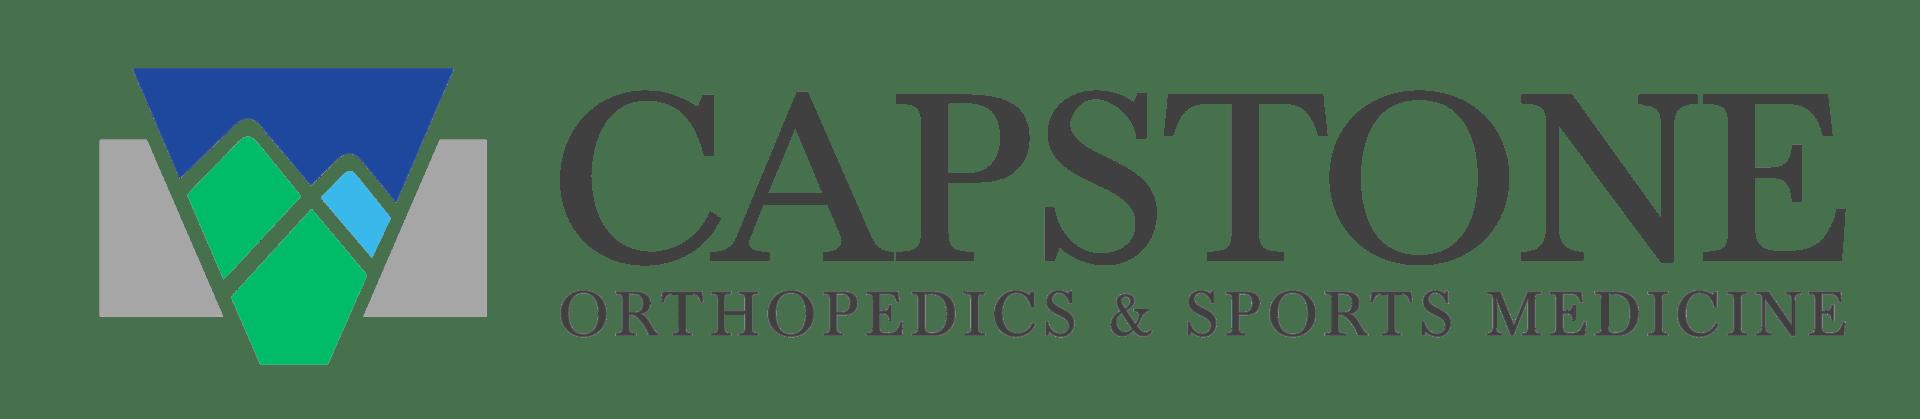 Capstone Orthopedics